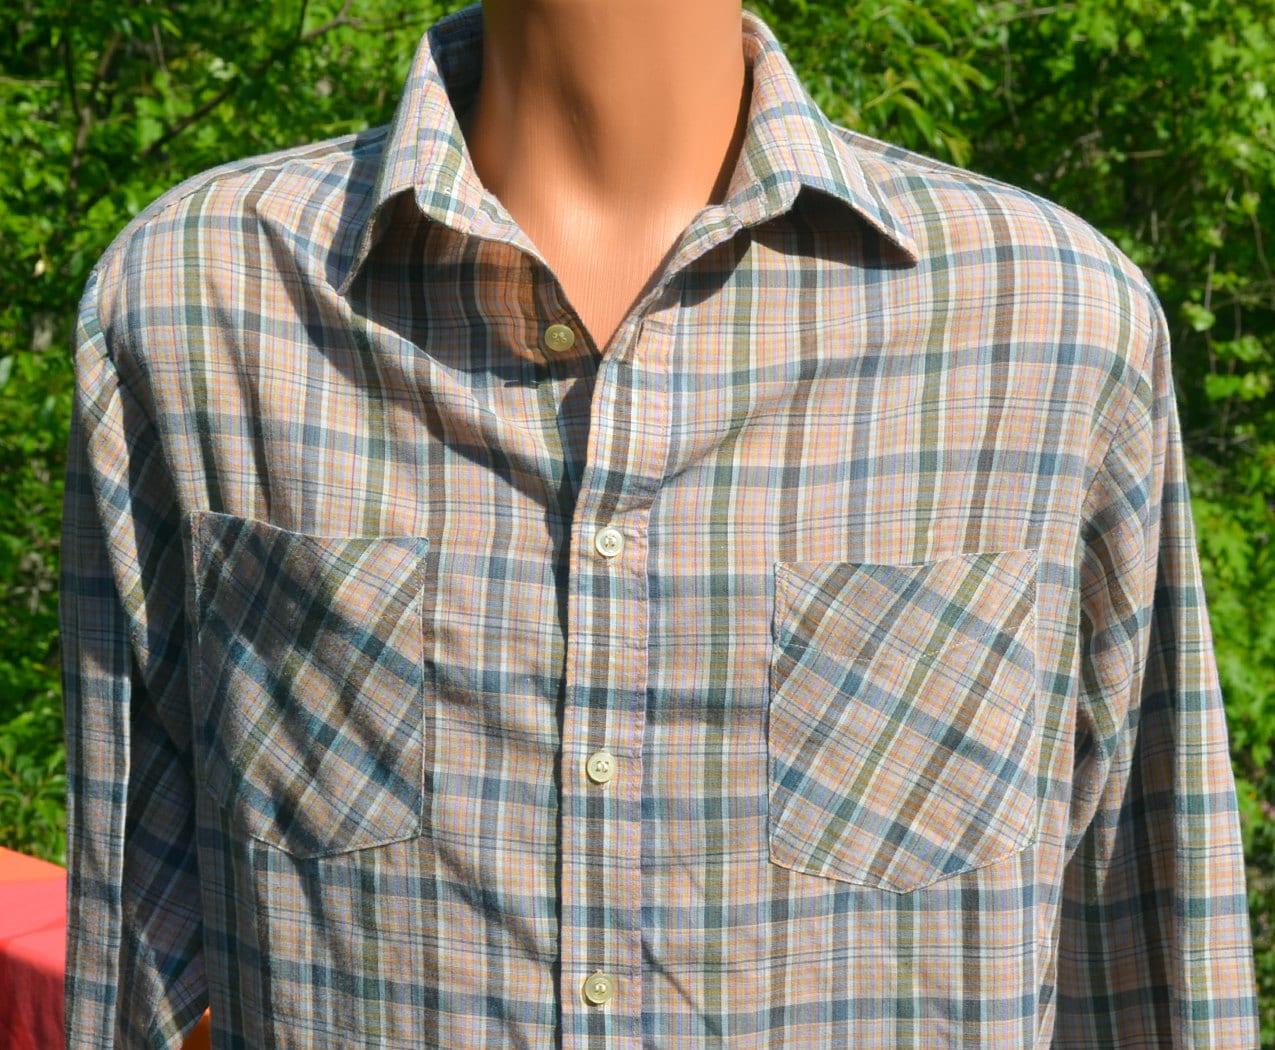 Vintage 70s Bud Berma Plaid Shirt Button Down Weekender Light